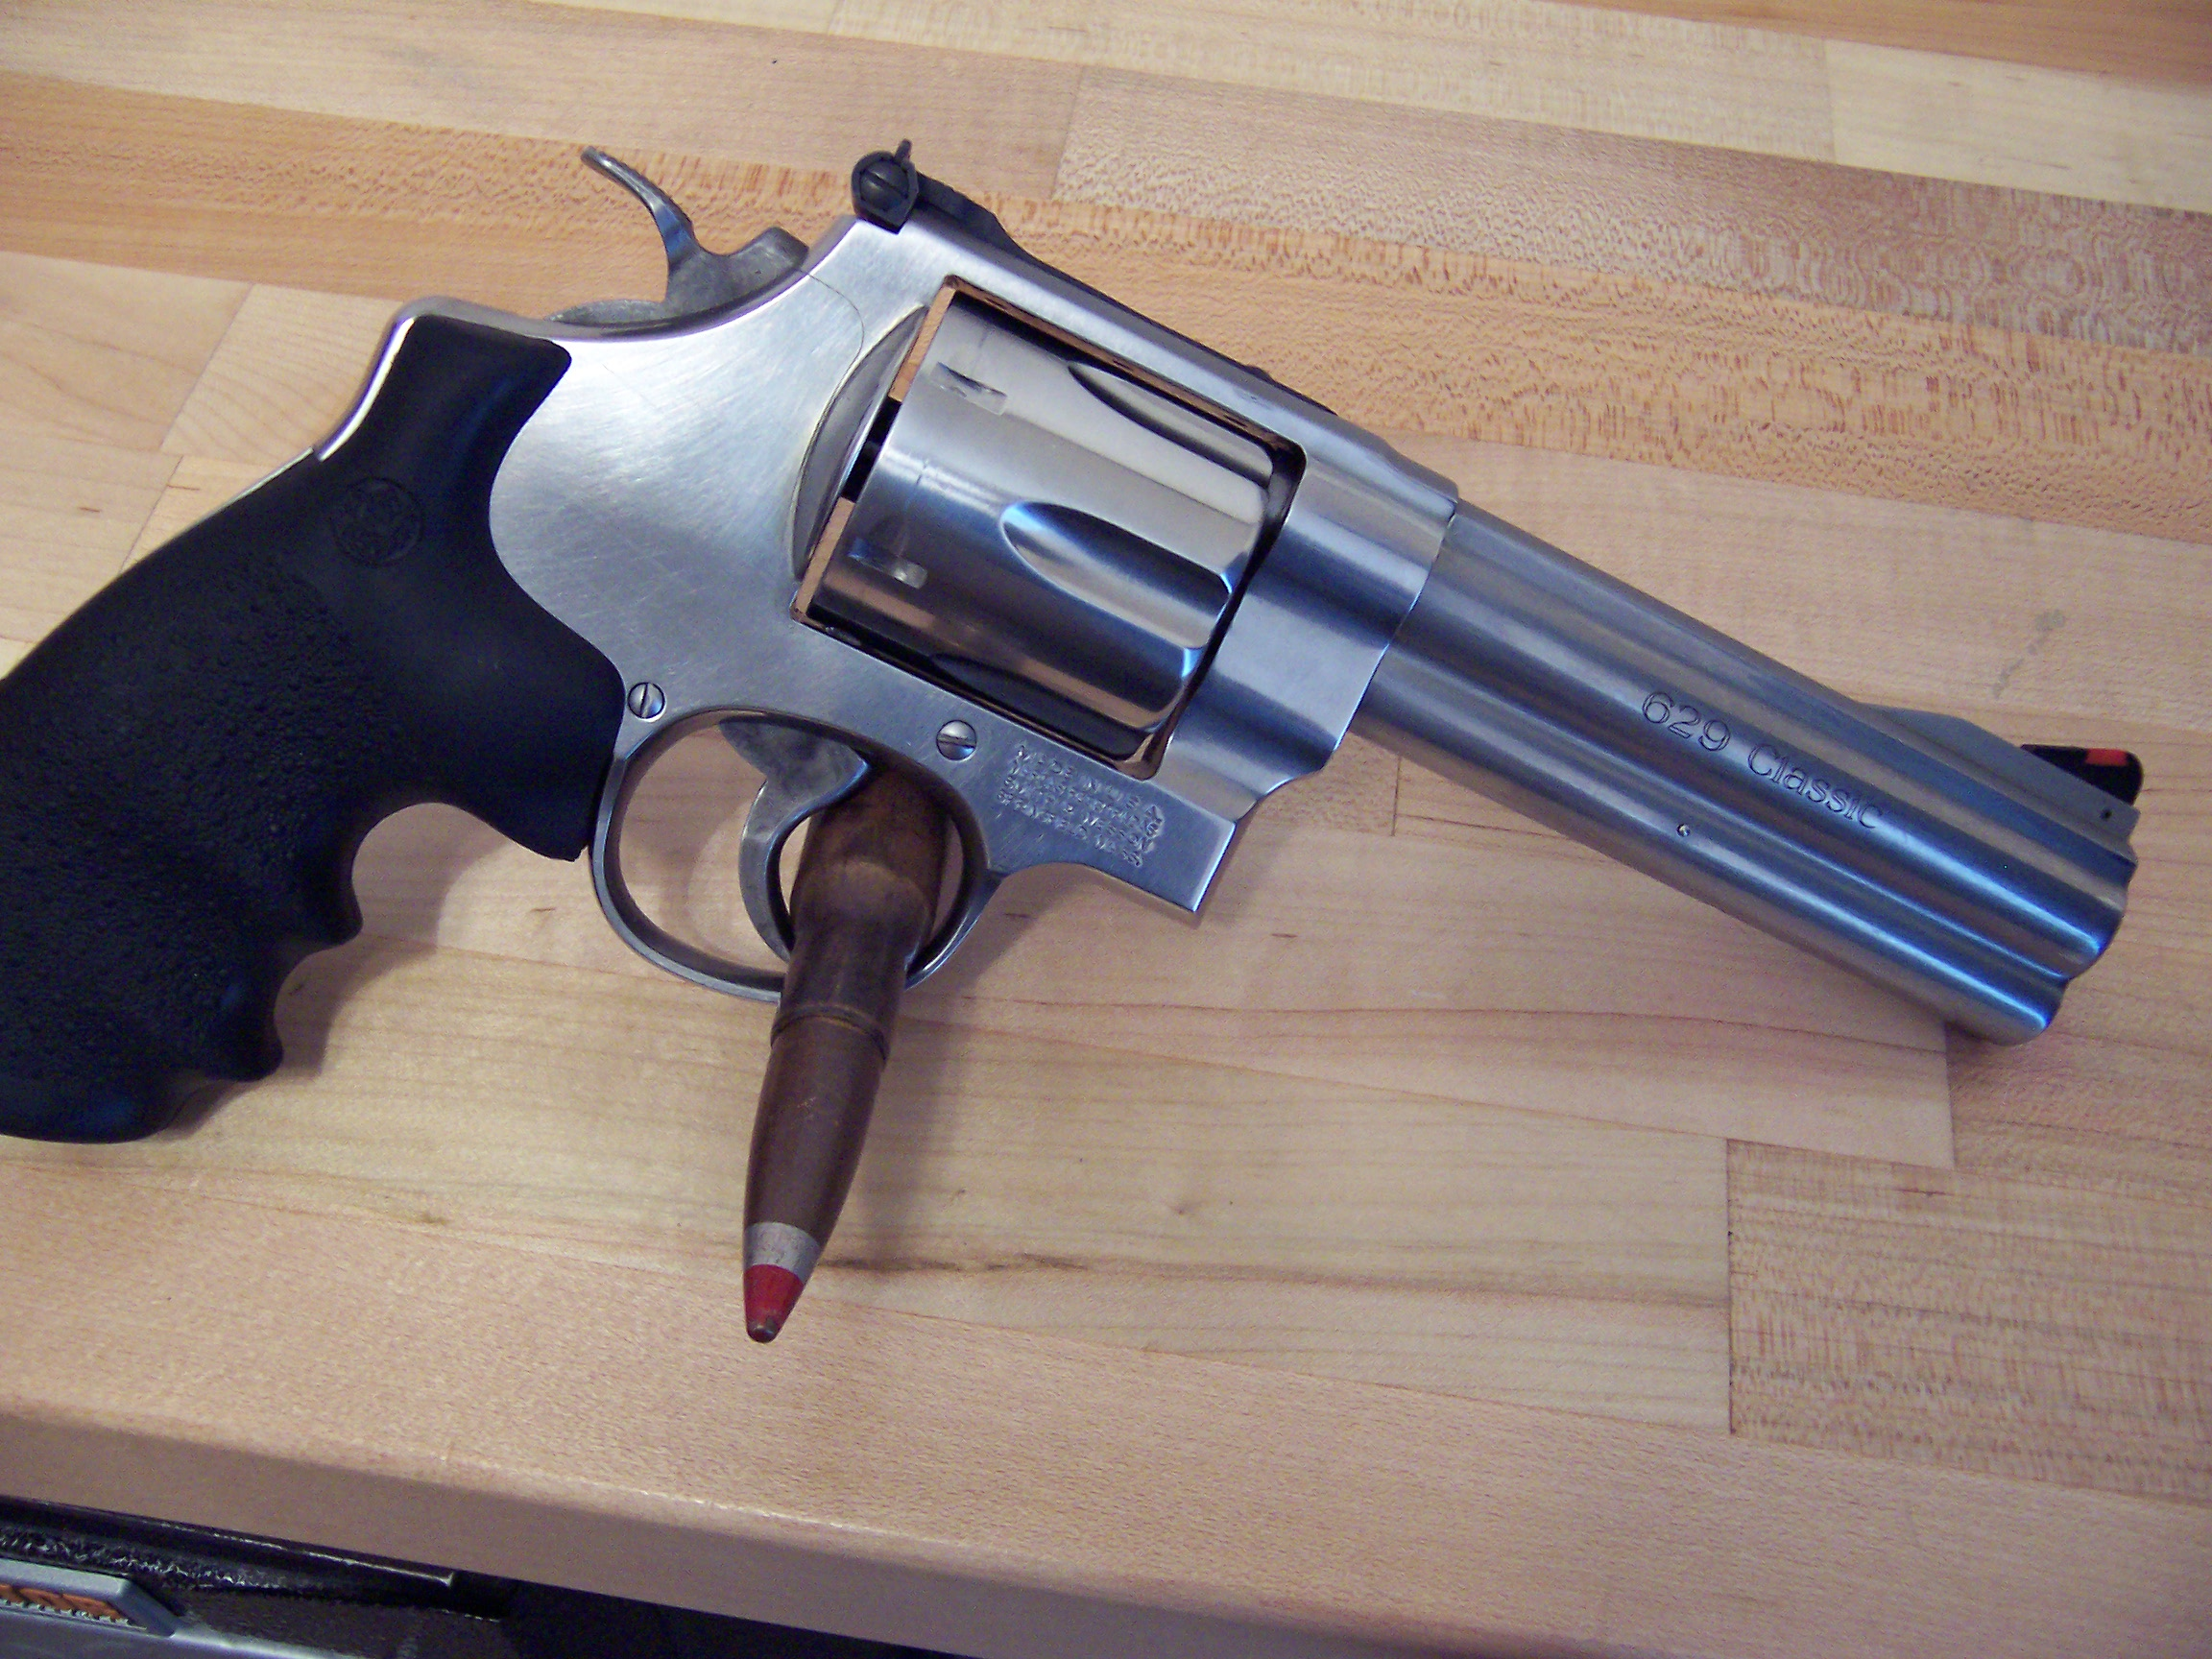 629 Classic 6.5 or 5 inch Classic?-guns-030.jpg